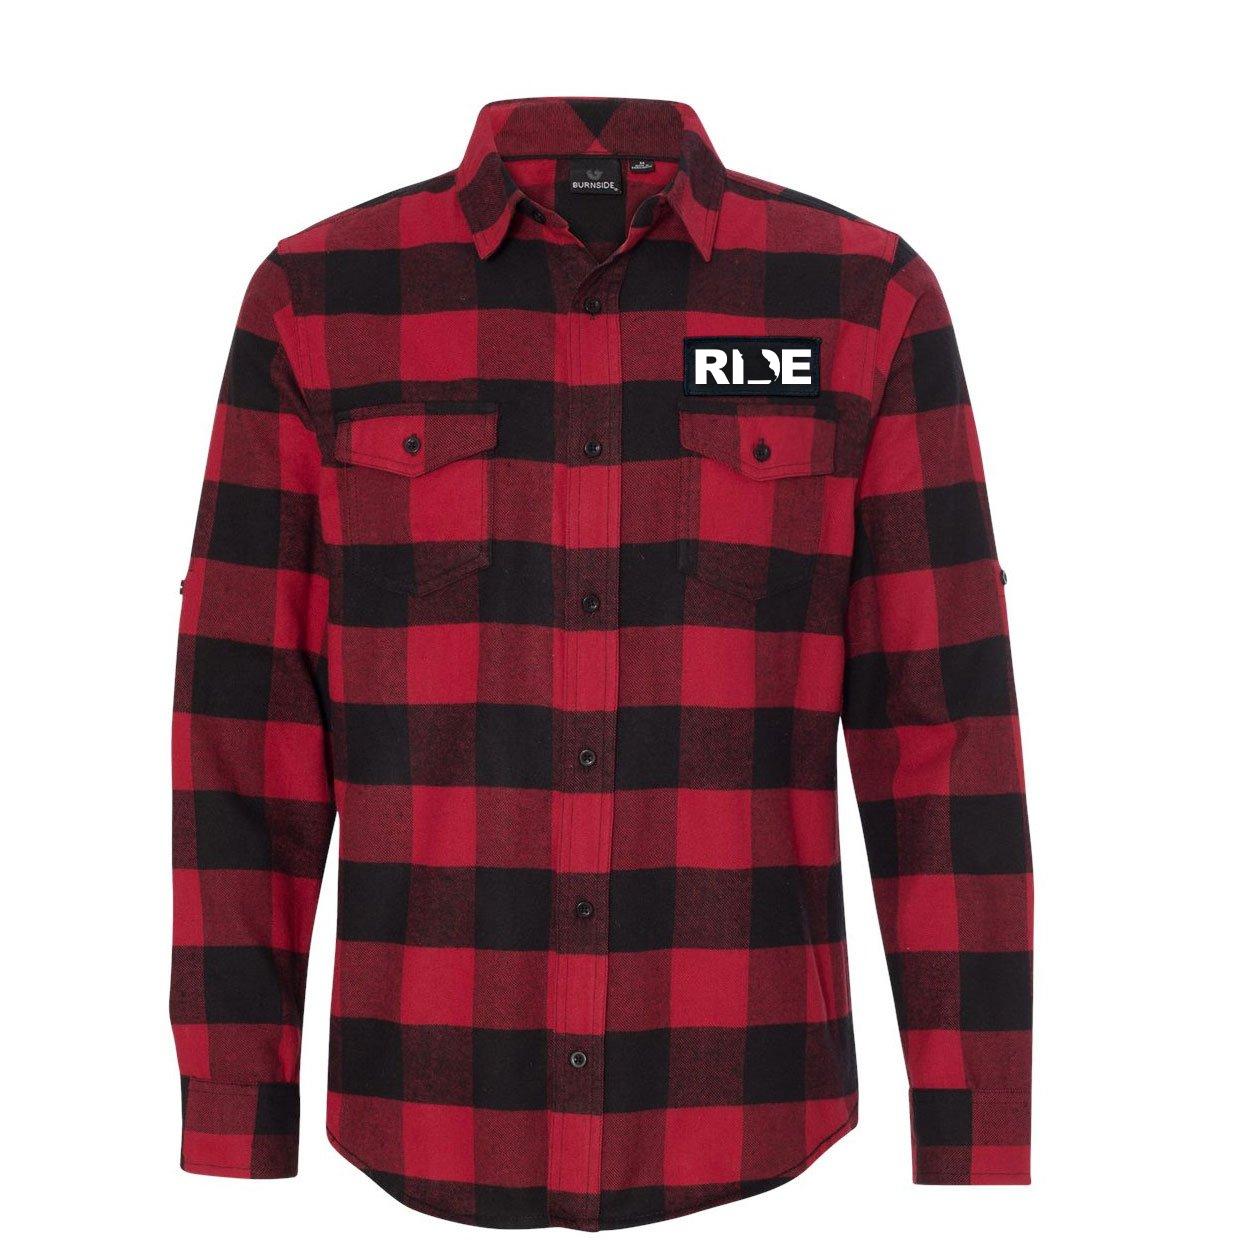 Ride Missouri Classic Unisex Long Sleeve Woven Patch Flannel Shirt Red/Black Buffalo (White Logo)